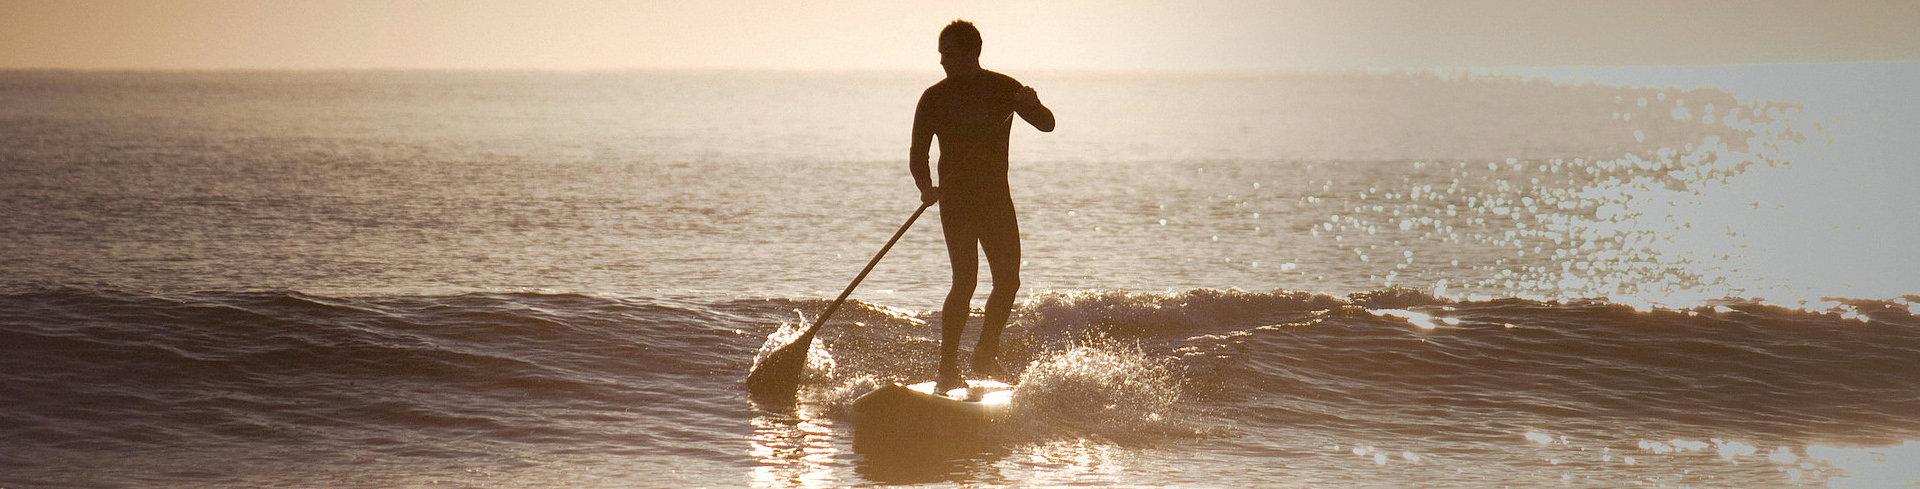 Pano-Surfer.jpg